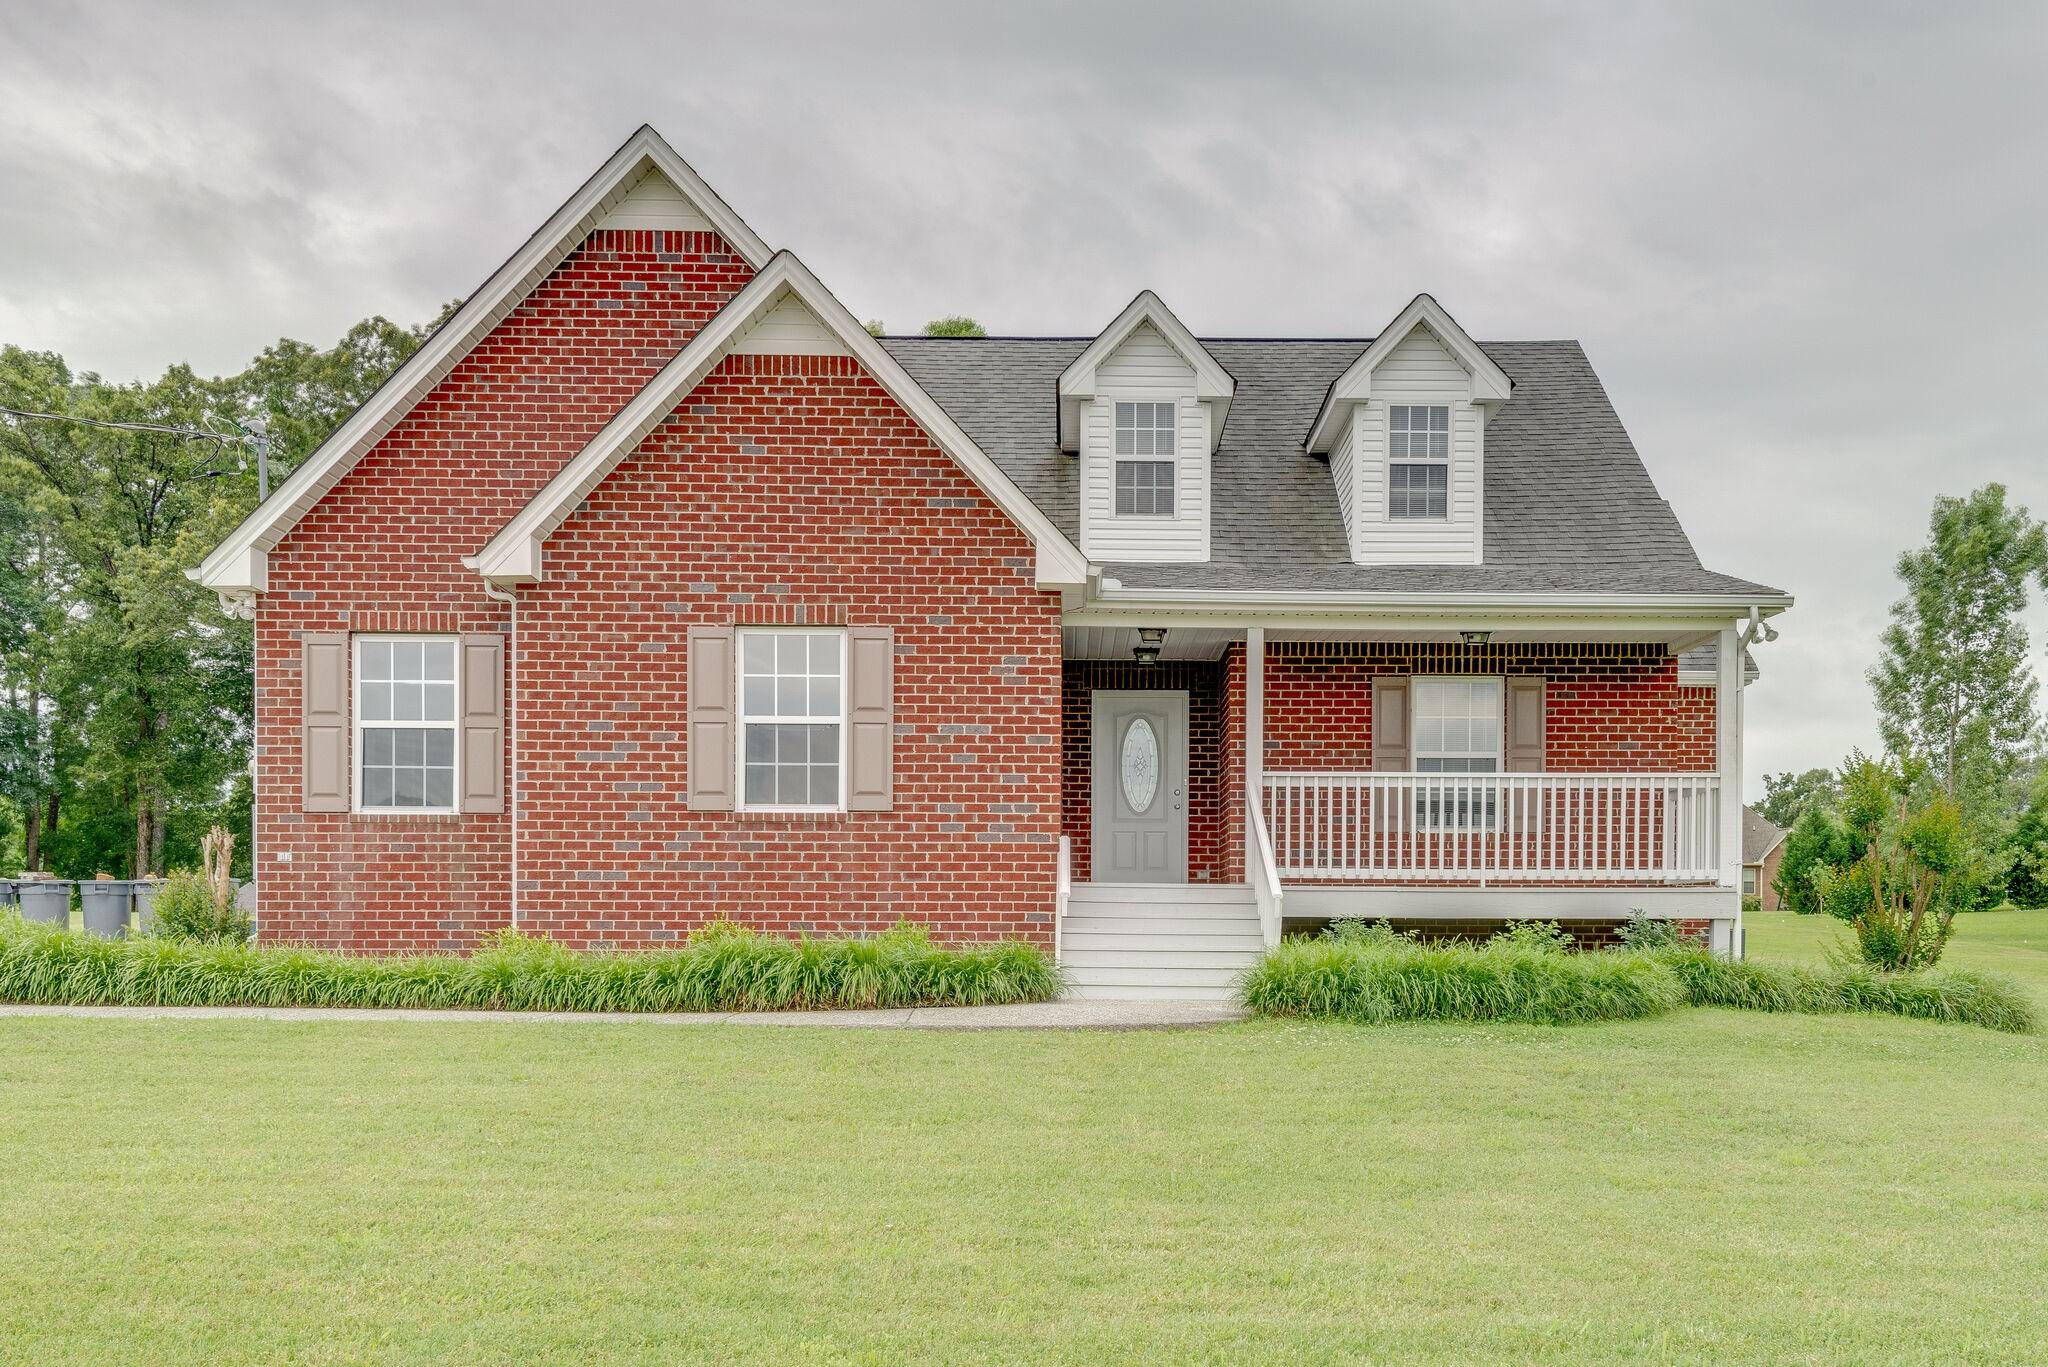 265 Eastside Rd Property Photo - Burns, TN real estate listing